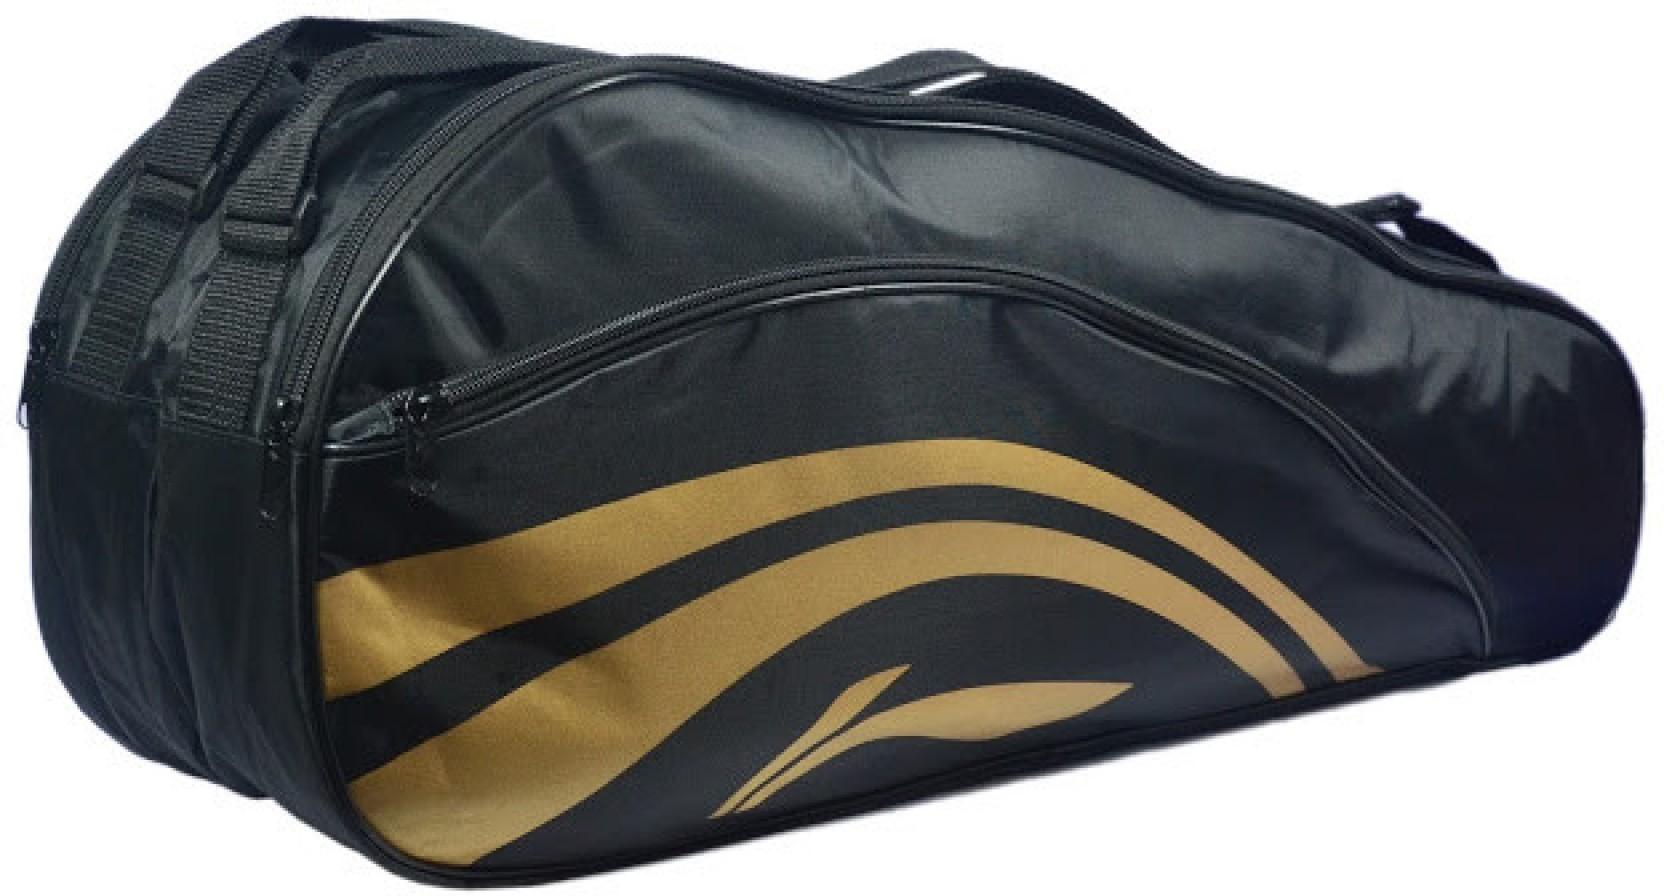 Li Ning 2 In 1 Thermal Double Belt Bag Buy Grip Lining Gp 34a Original On Offer